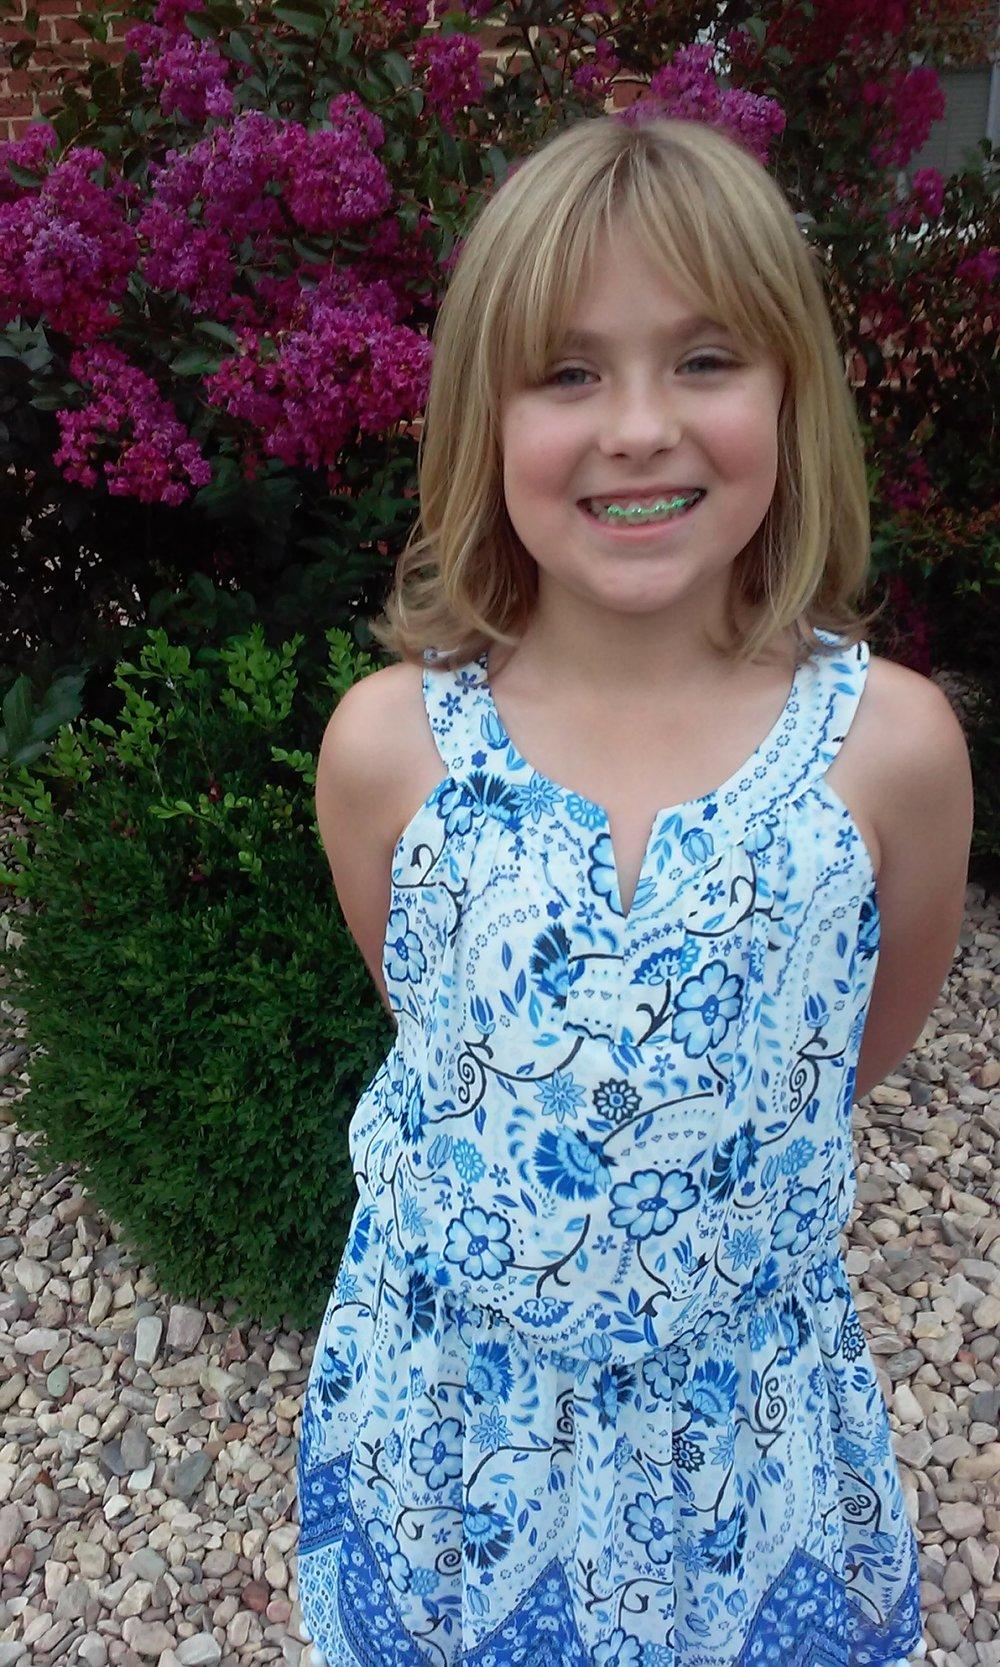 Haley Walker, 9 years old